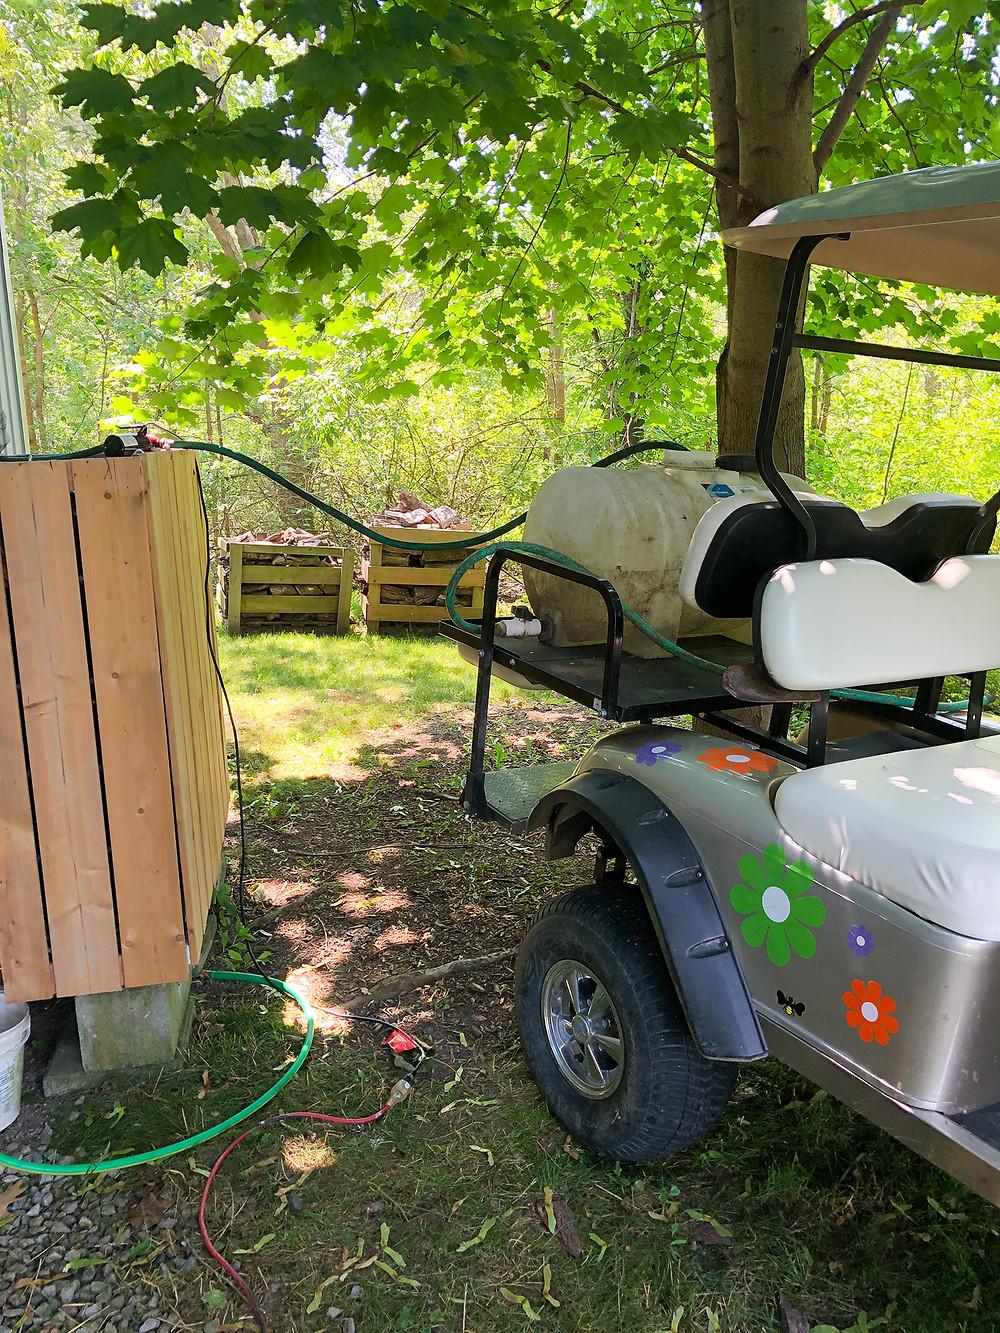 rain water collection, rain barrel, electric golf cart